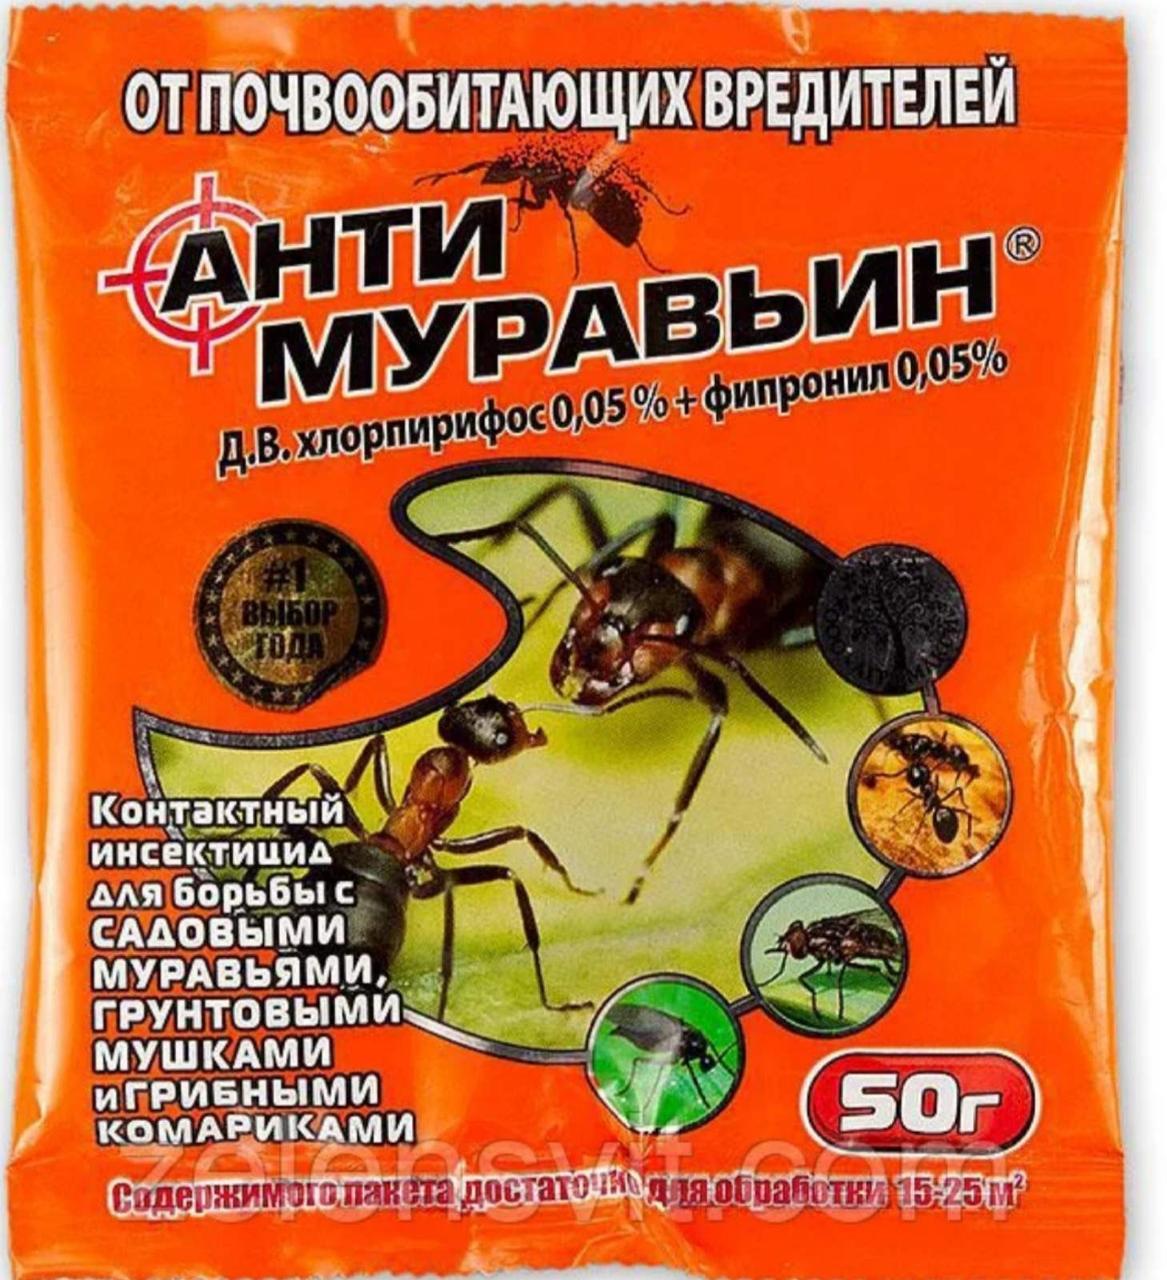 Інсектицид АНТИМУРАВЬИН 50гр. Агромакси